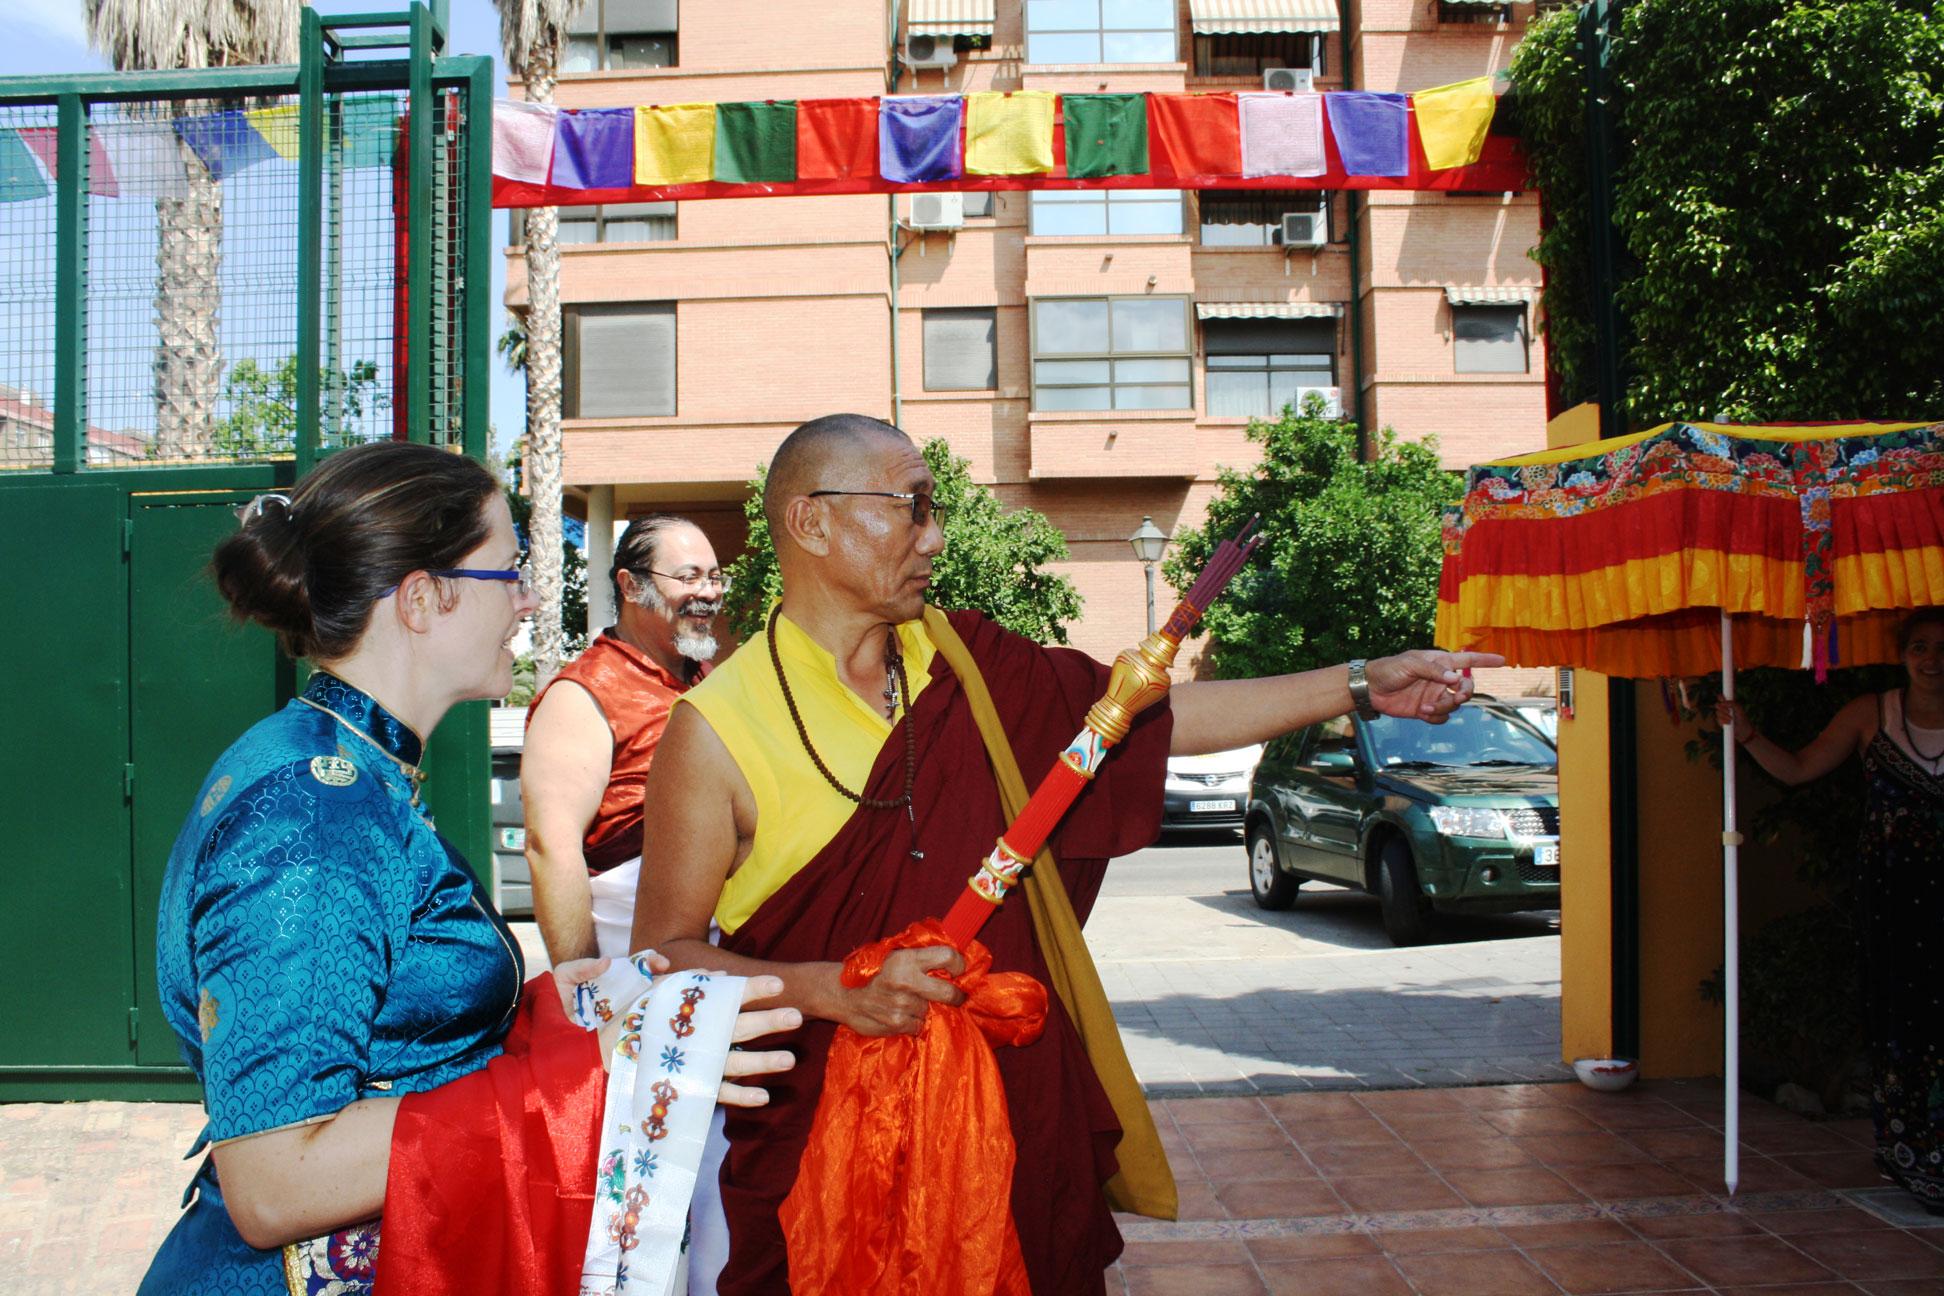 SS-Dudjom-Rinpoche-Sangye-Pema-Zhepa-evento-valencia-julio-2019-05